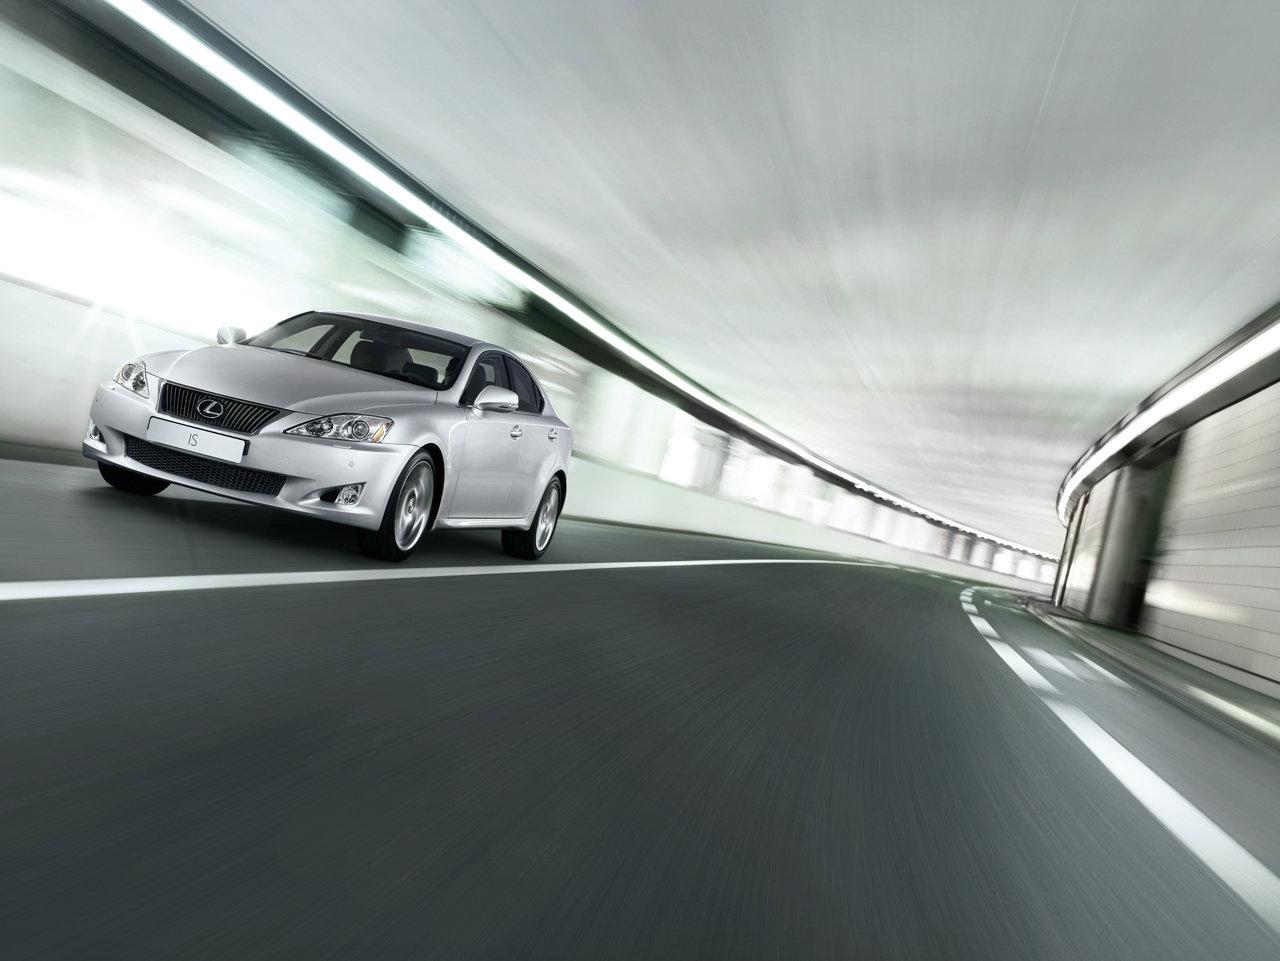 Nuova Lexus IS 200d: 2.2 diesel da 150 CV